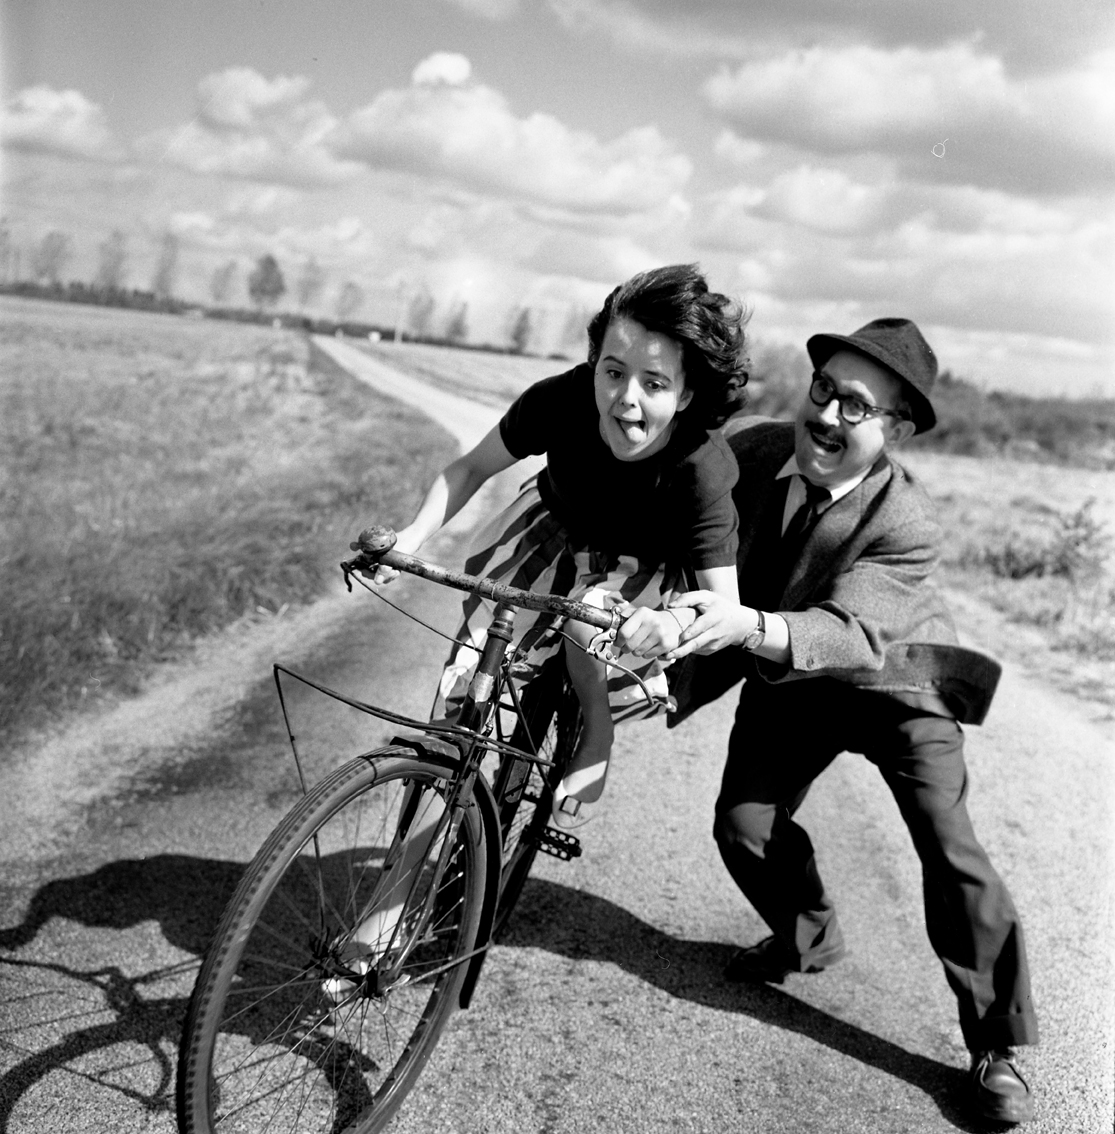 Robert Doisneau - Bike lesson